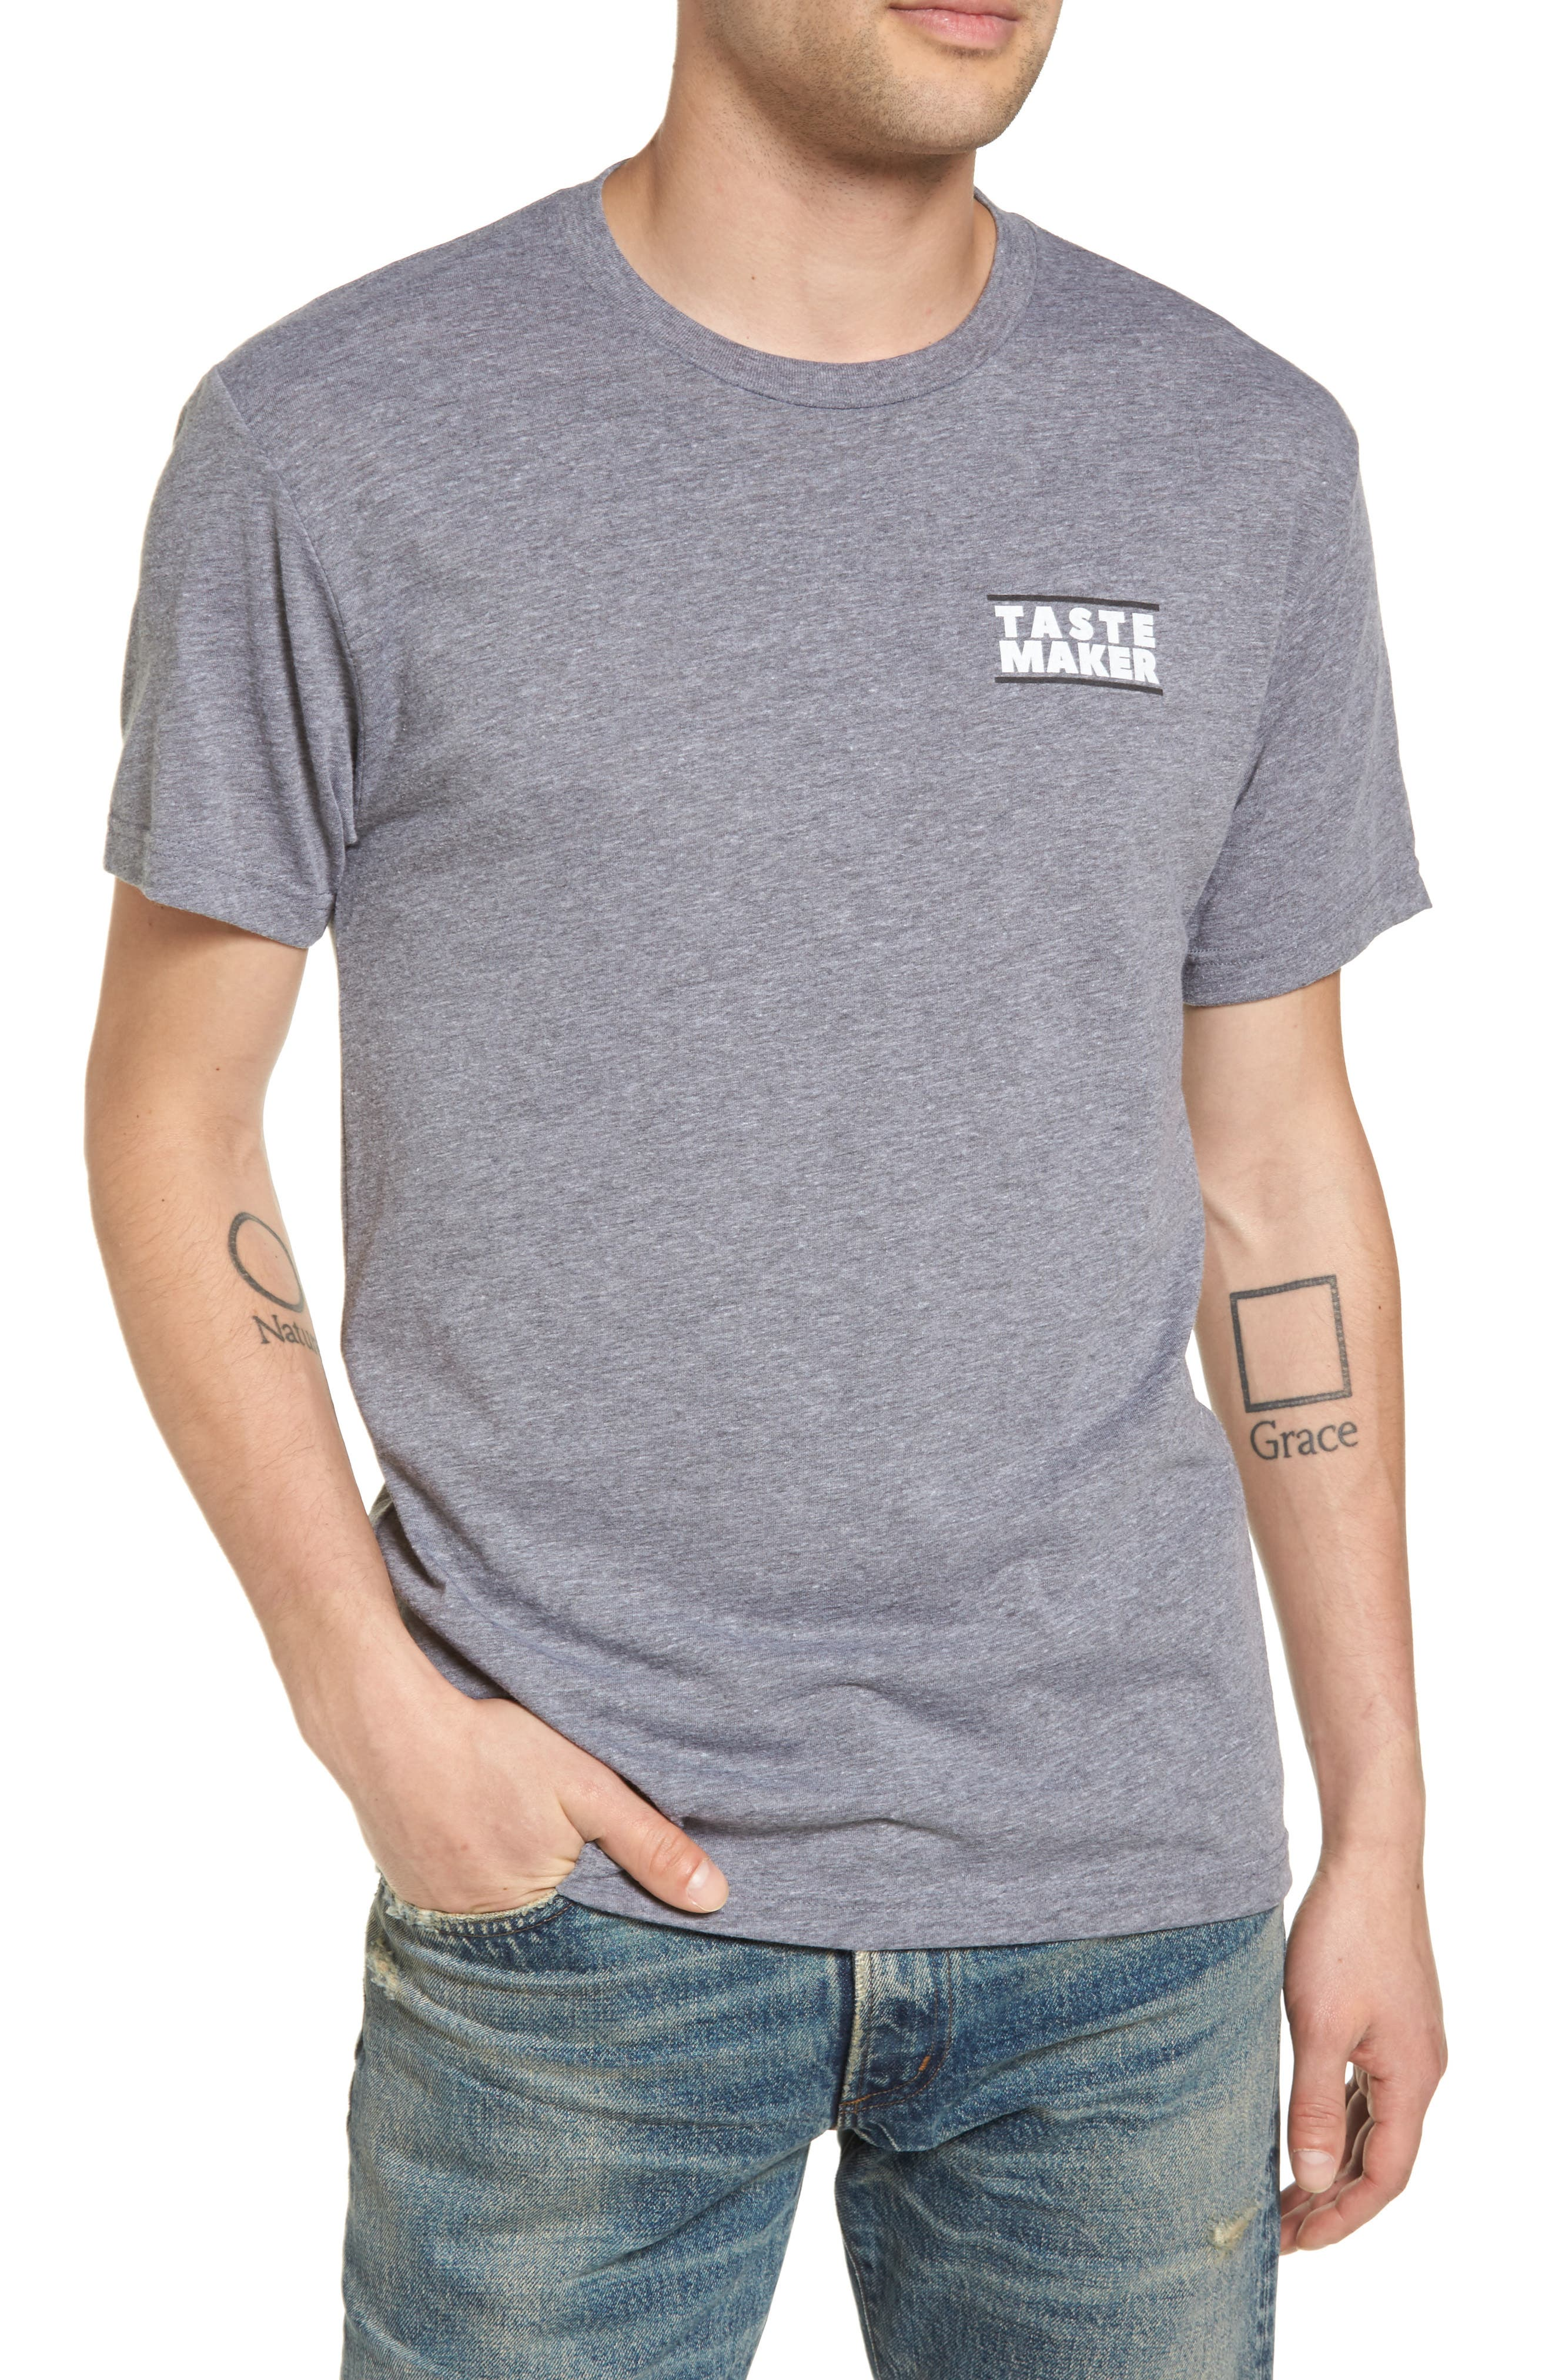 Kid Dangerous Tastemaker Graphic T-Shirt